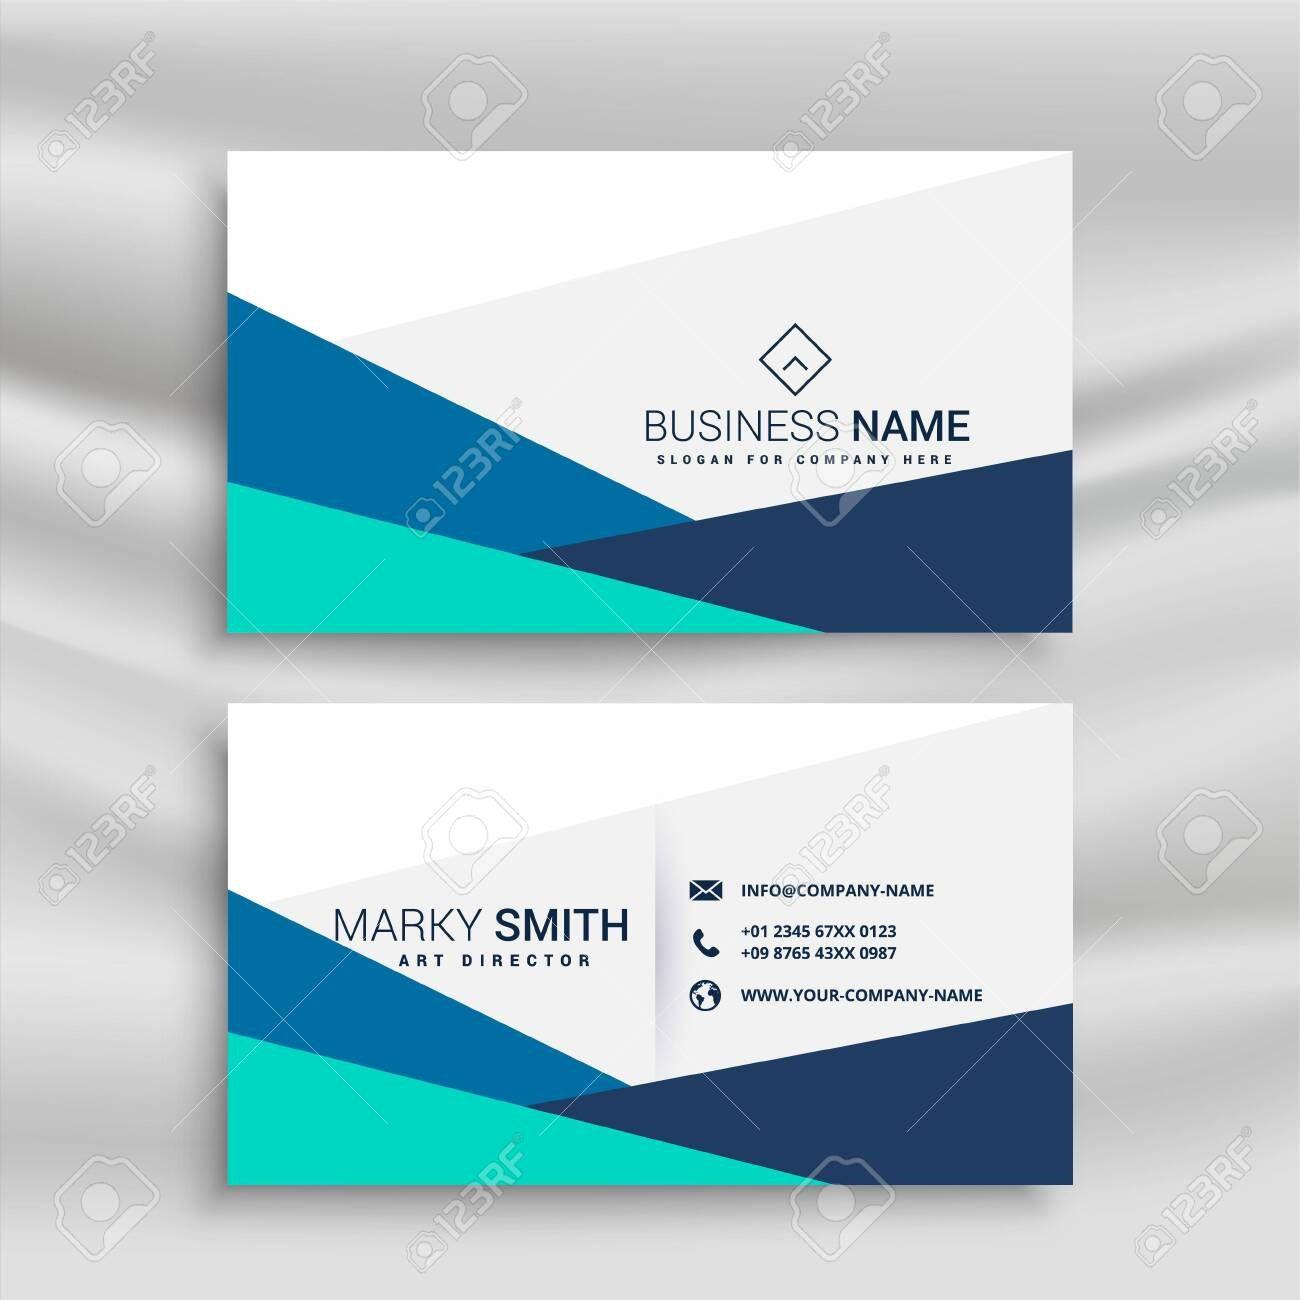 001 Sensational Simple Visiting Card Design Example  Busines Idea Psd File Free DownloadFull